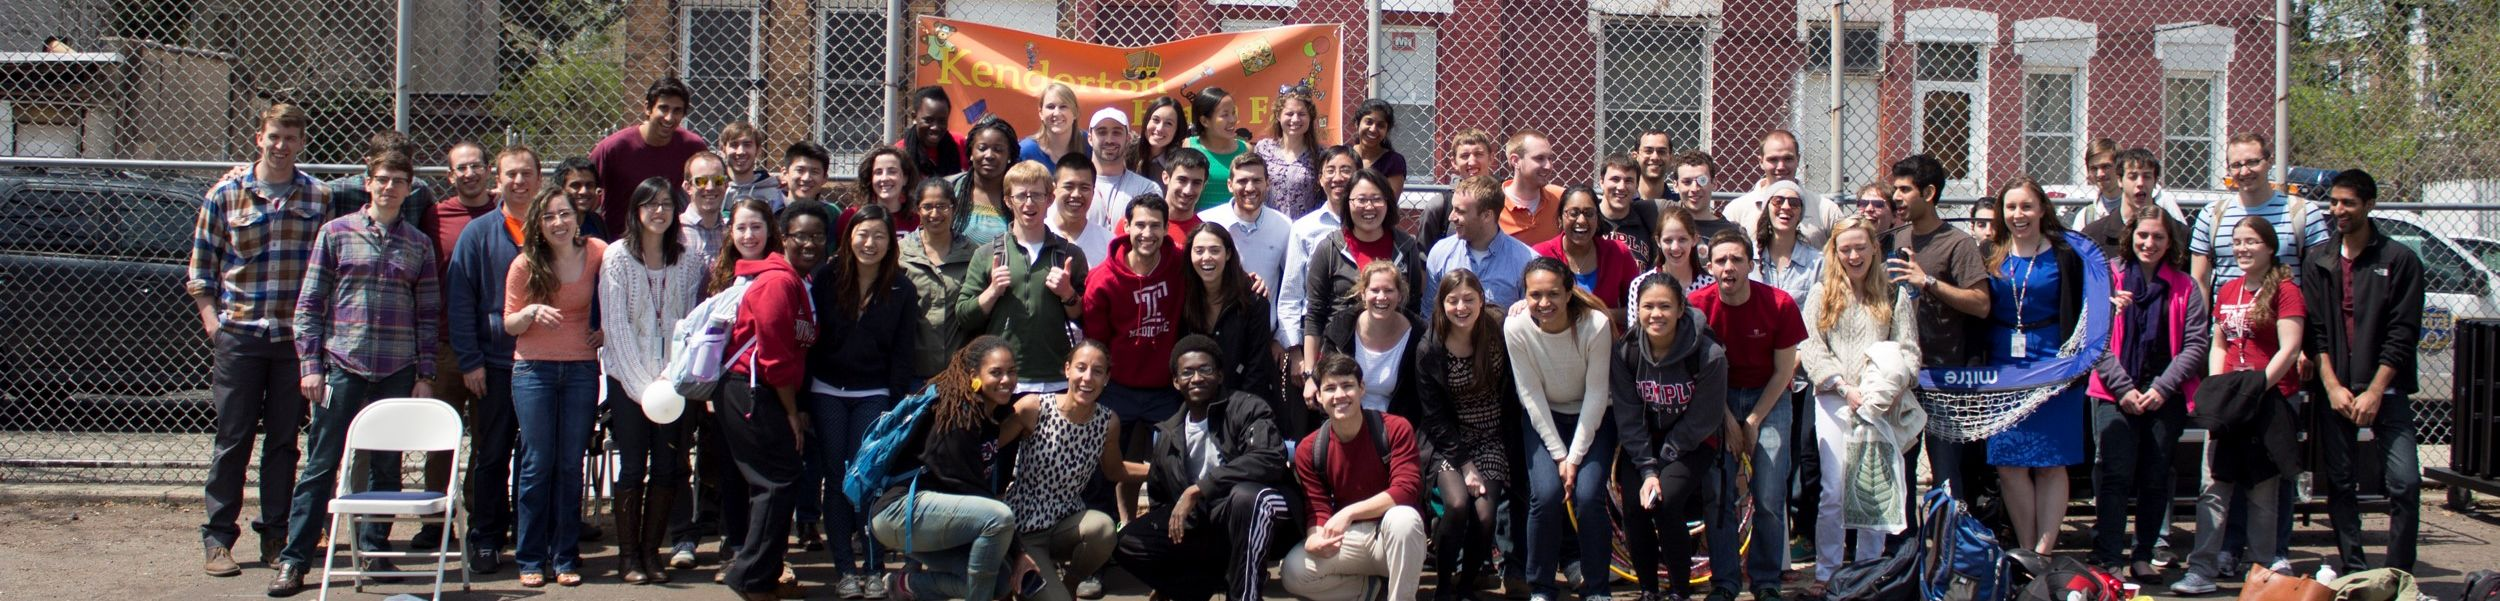 HSC Student Organizations